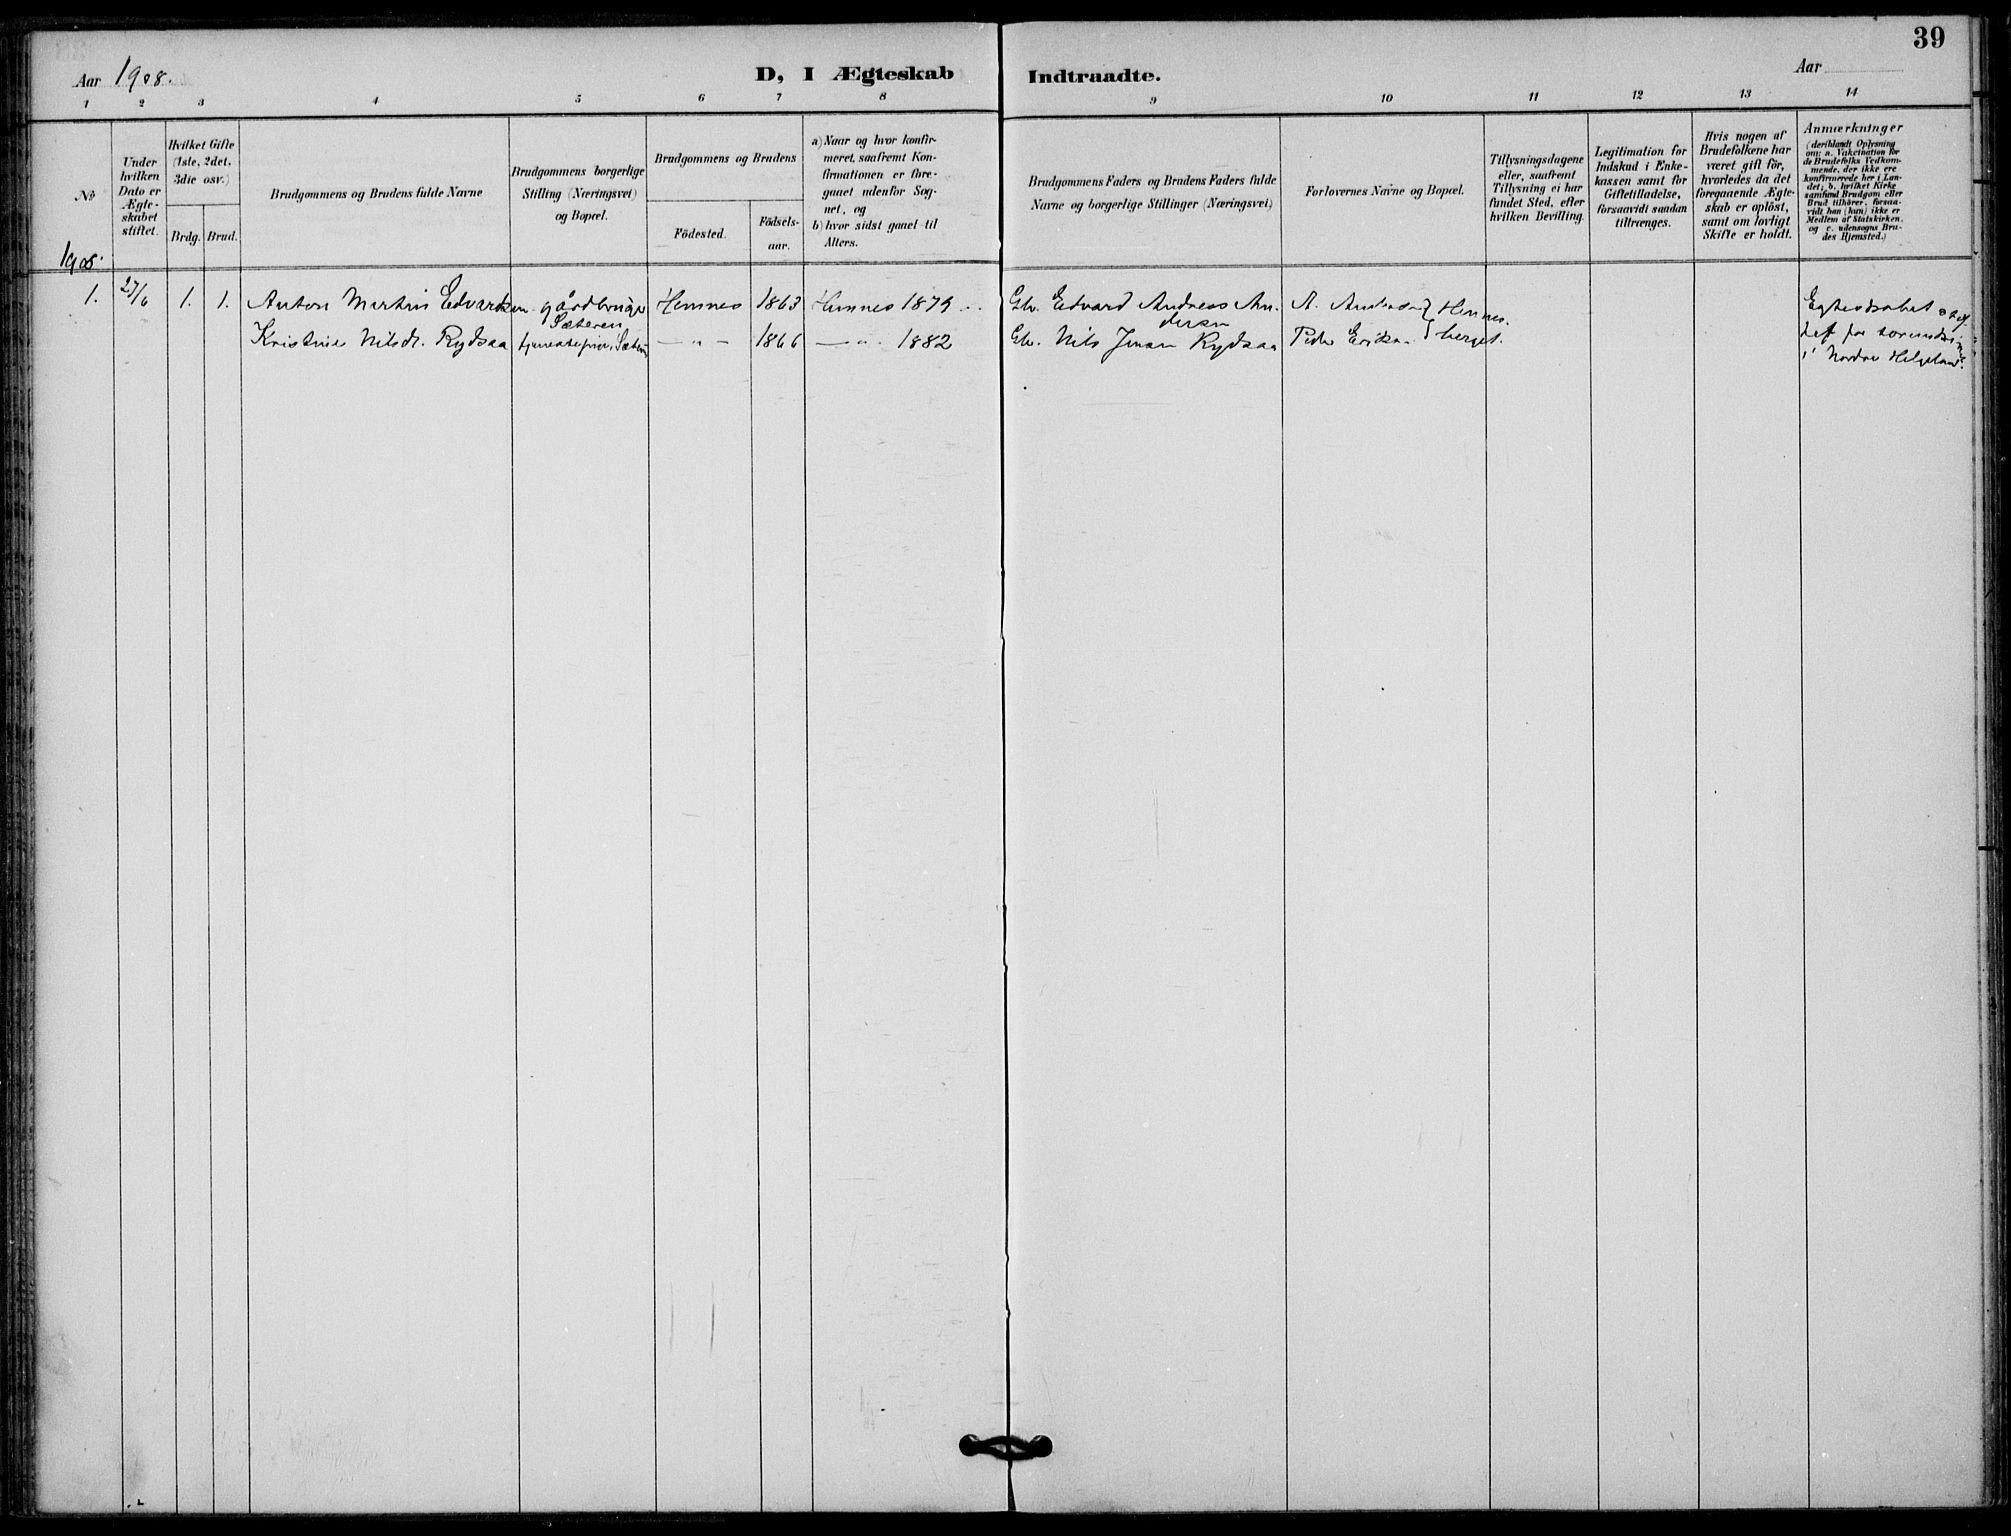 SAT, Ministerialprotokoller, klokkerbøker og fødselsregistre - Nordland, 825/L0363: Ministerialbok nr. 825A17, 1890-1909, s. 39